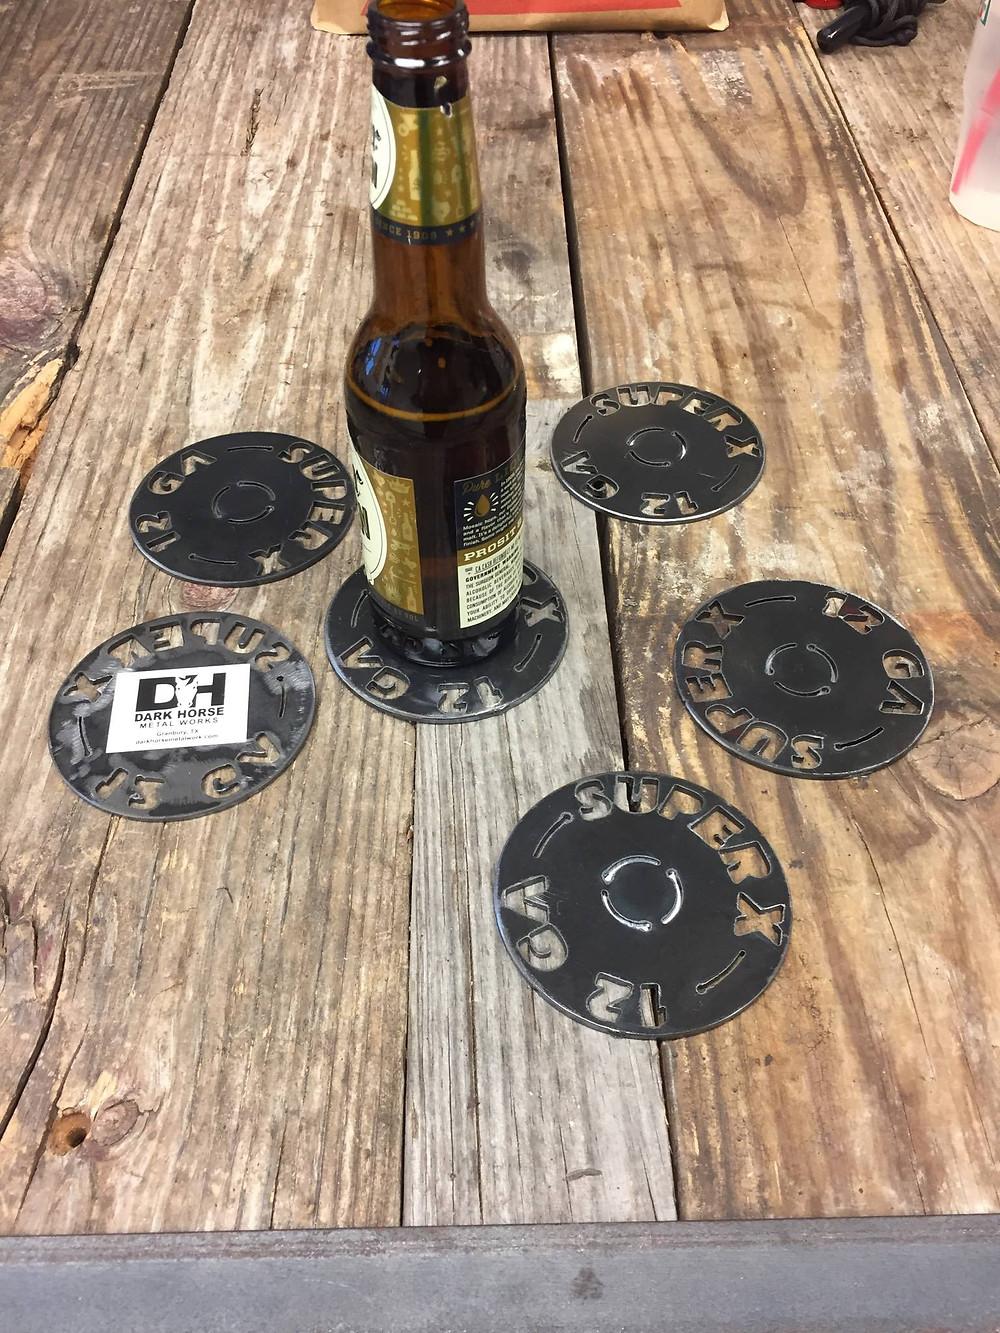 Metal cutouts CNC plasma cutter resembling 12 gauge shotgun | Granbury, TX